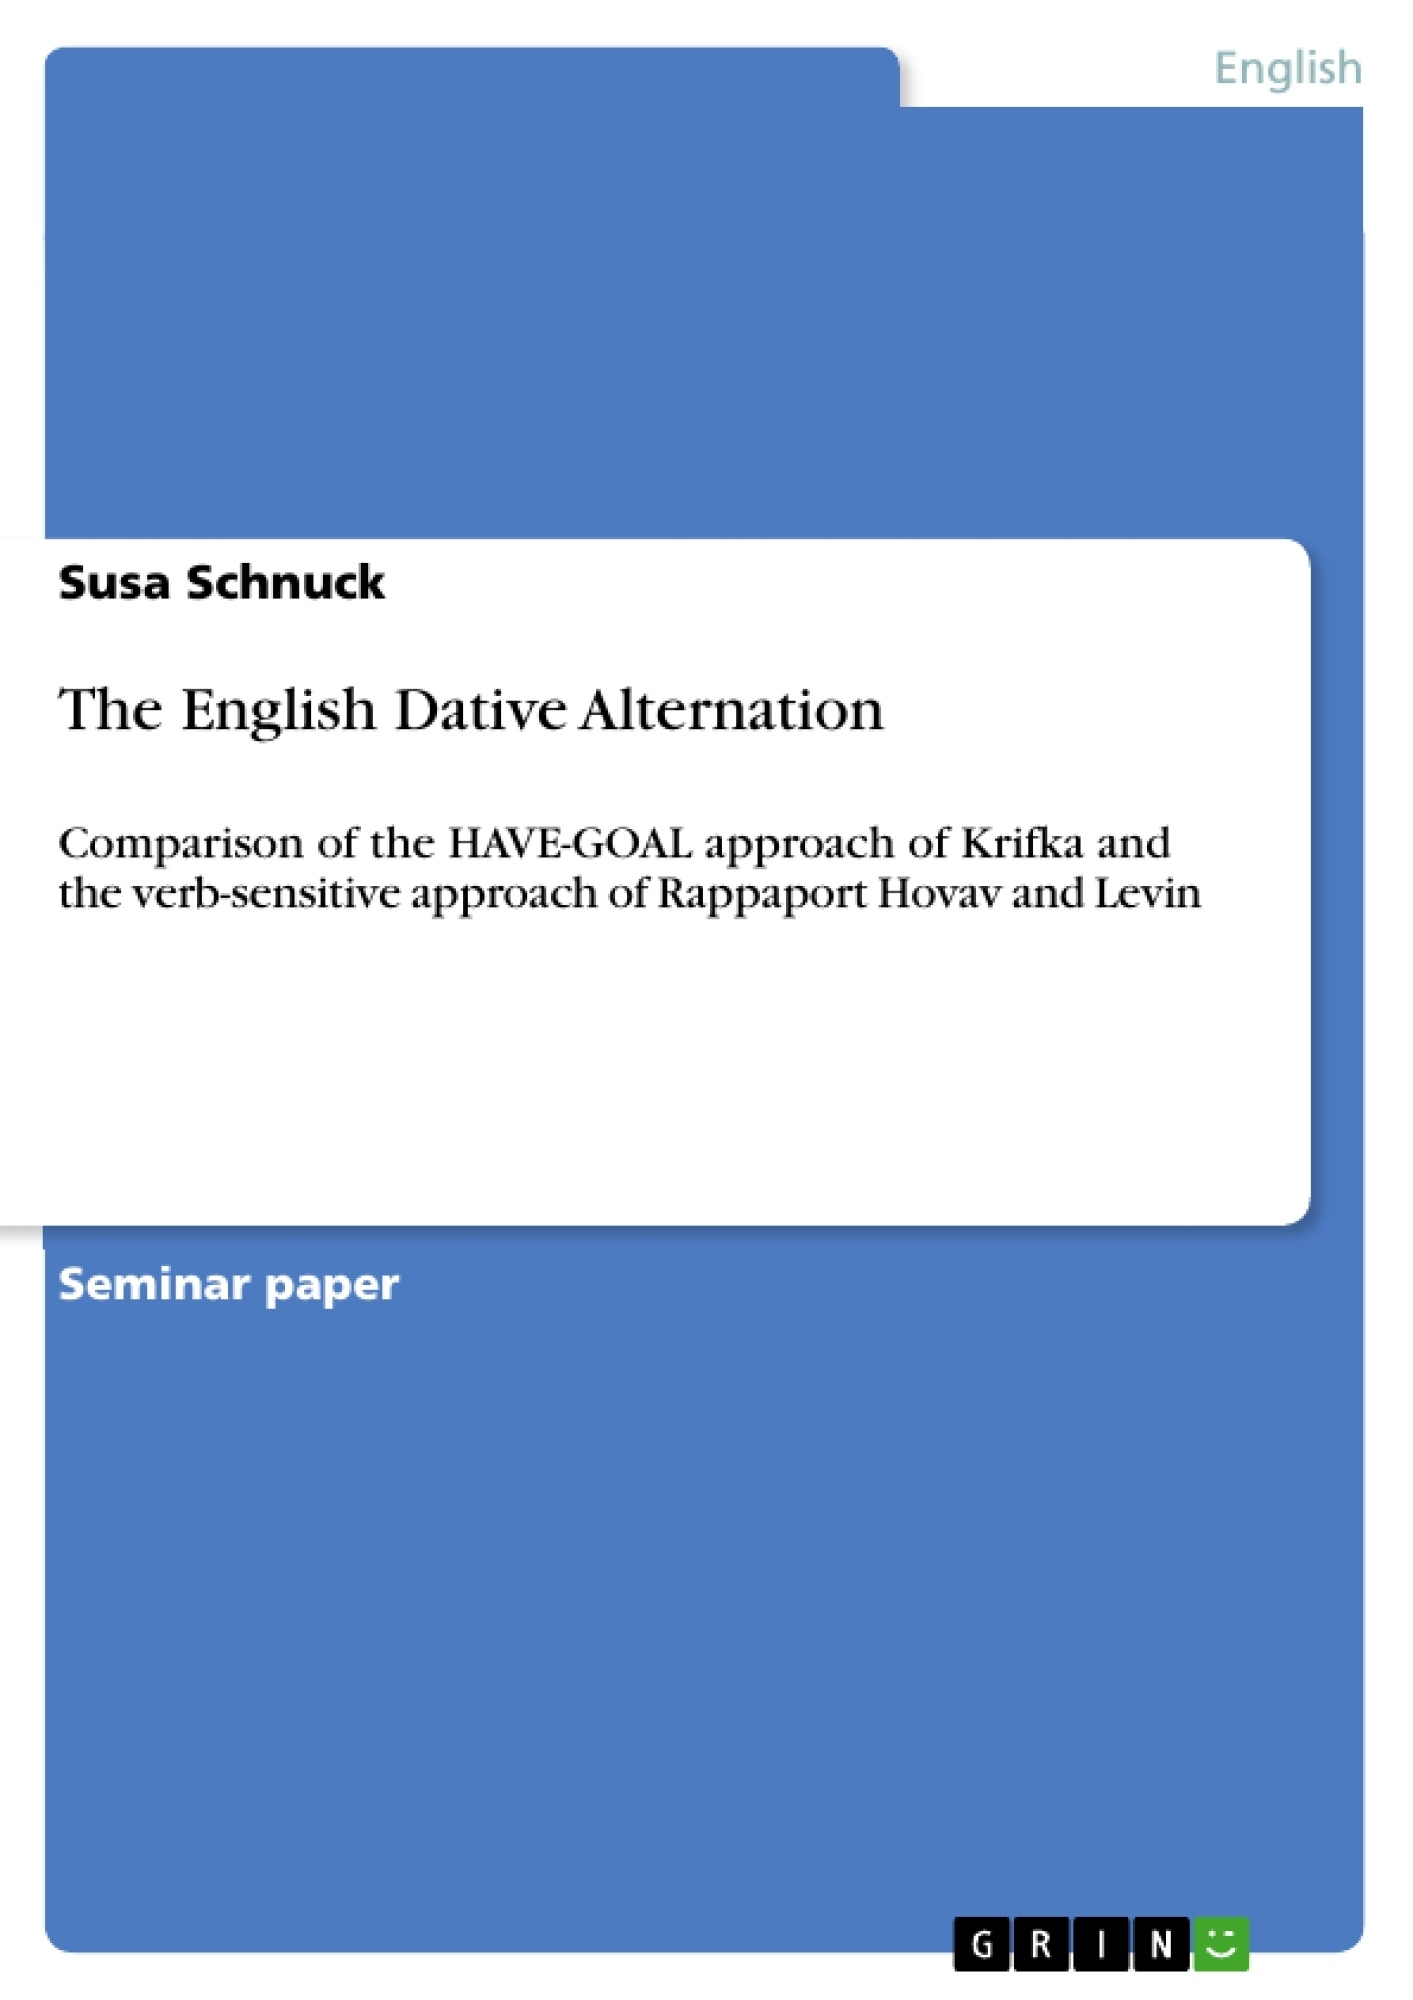 Title: The English Dative Alternation